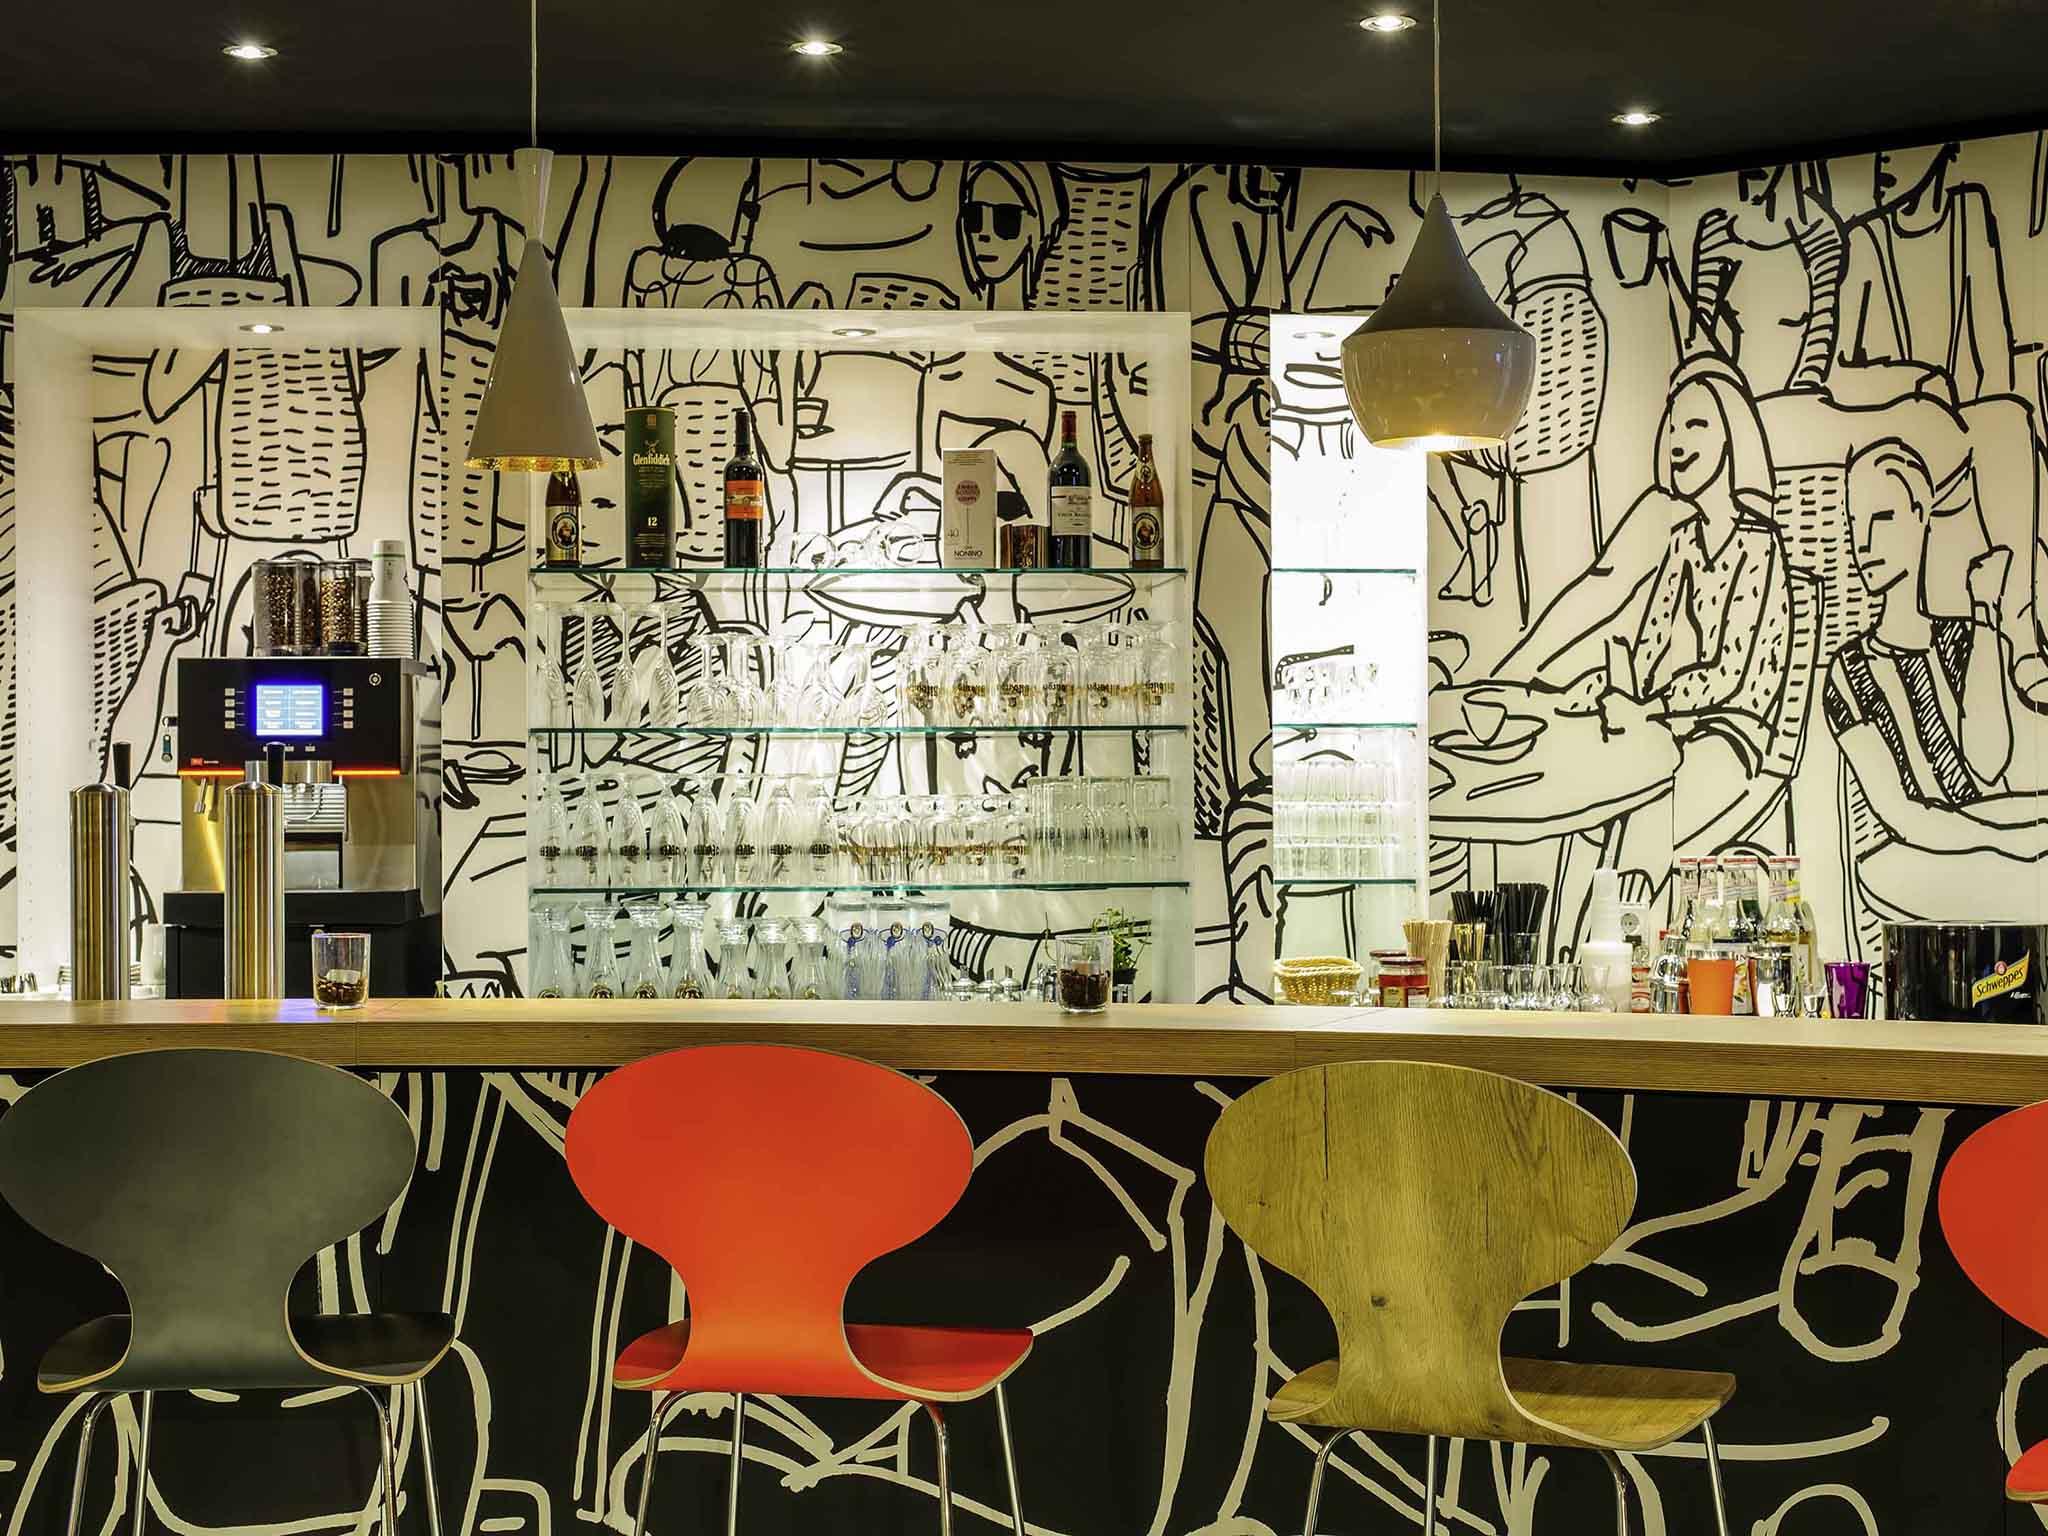 Hotel ibis Hamburg City. Book online now! (Opening November 2014)